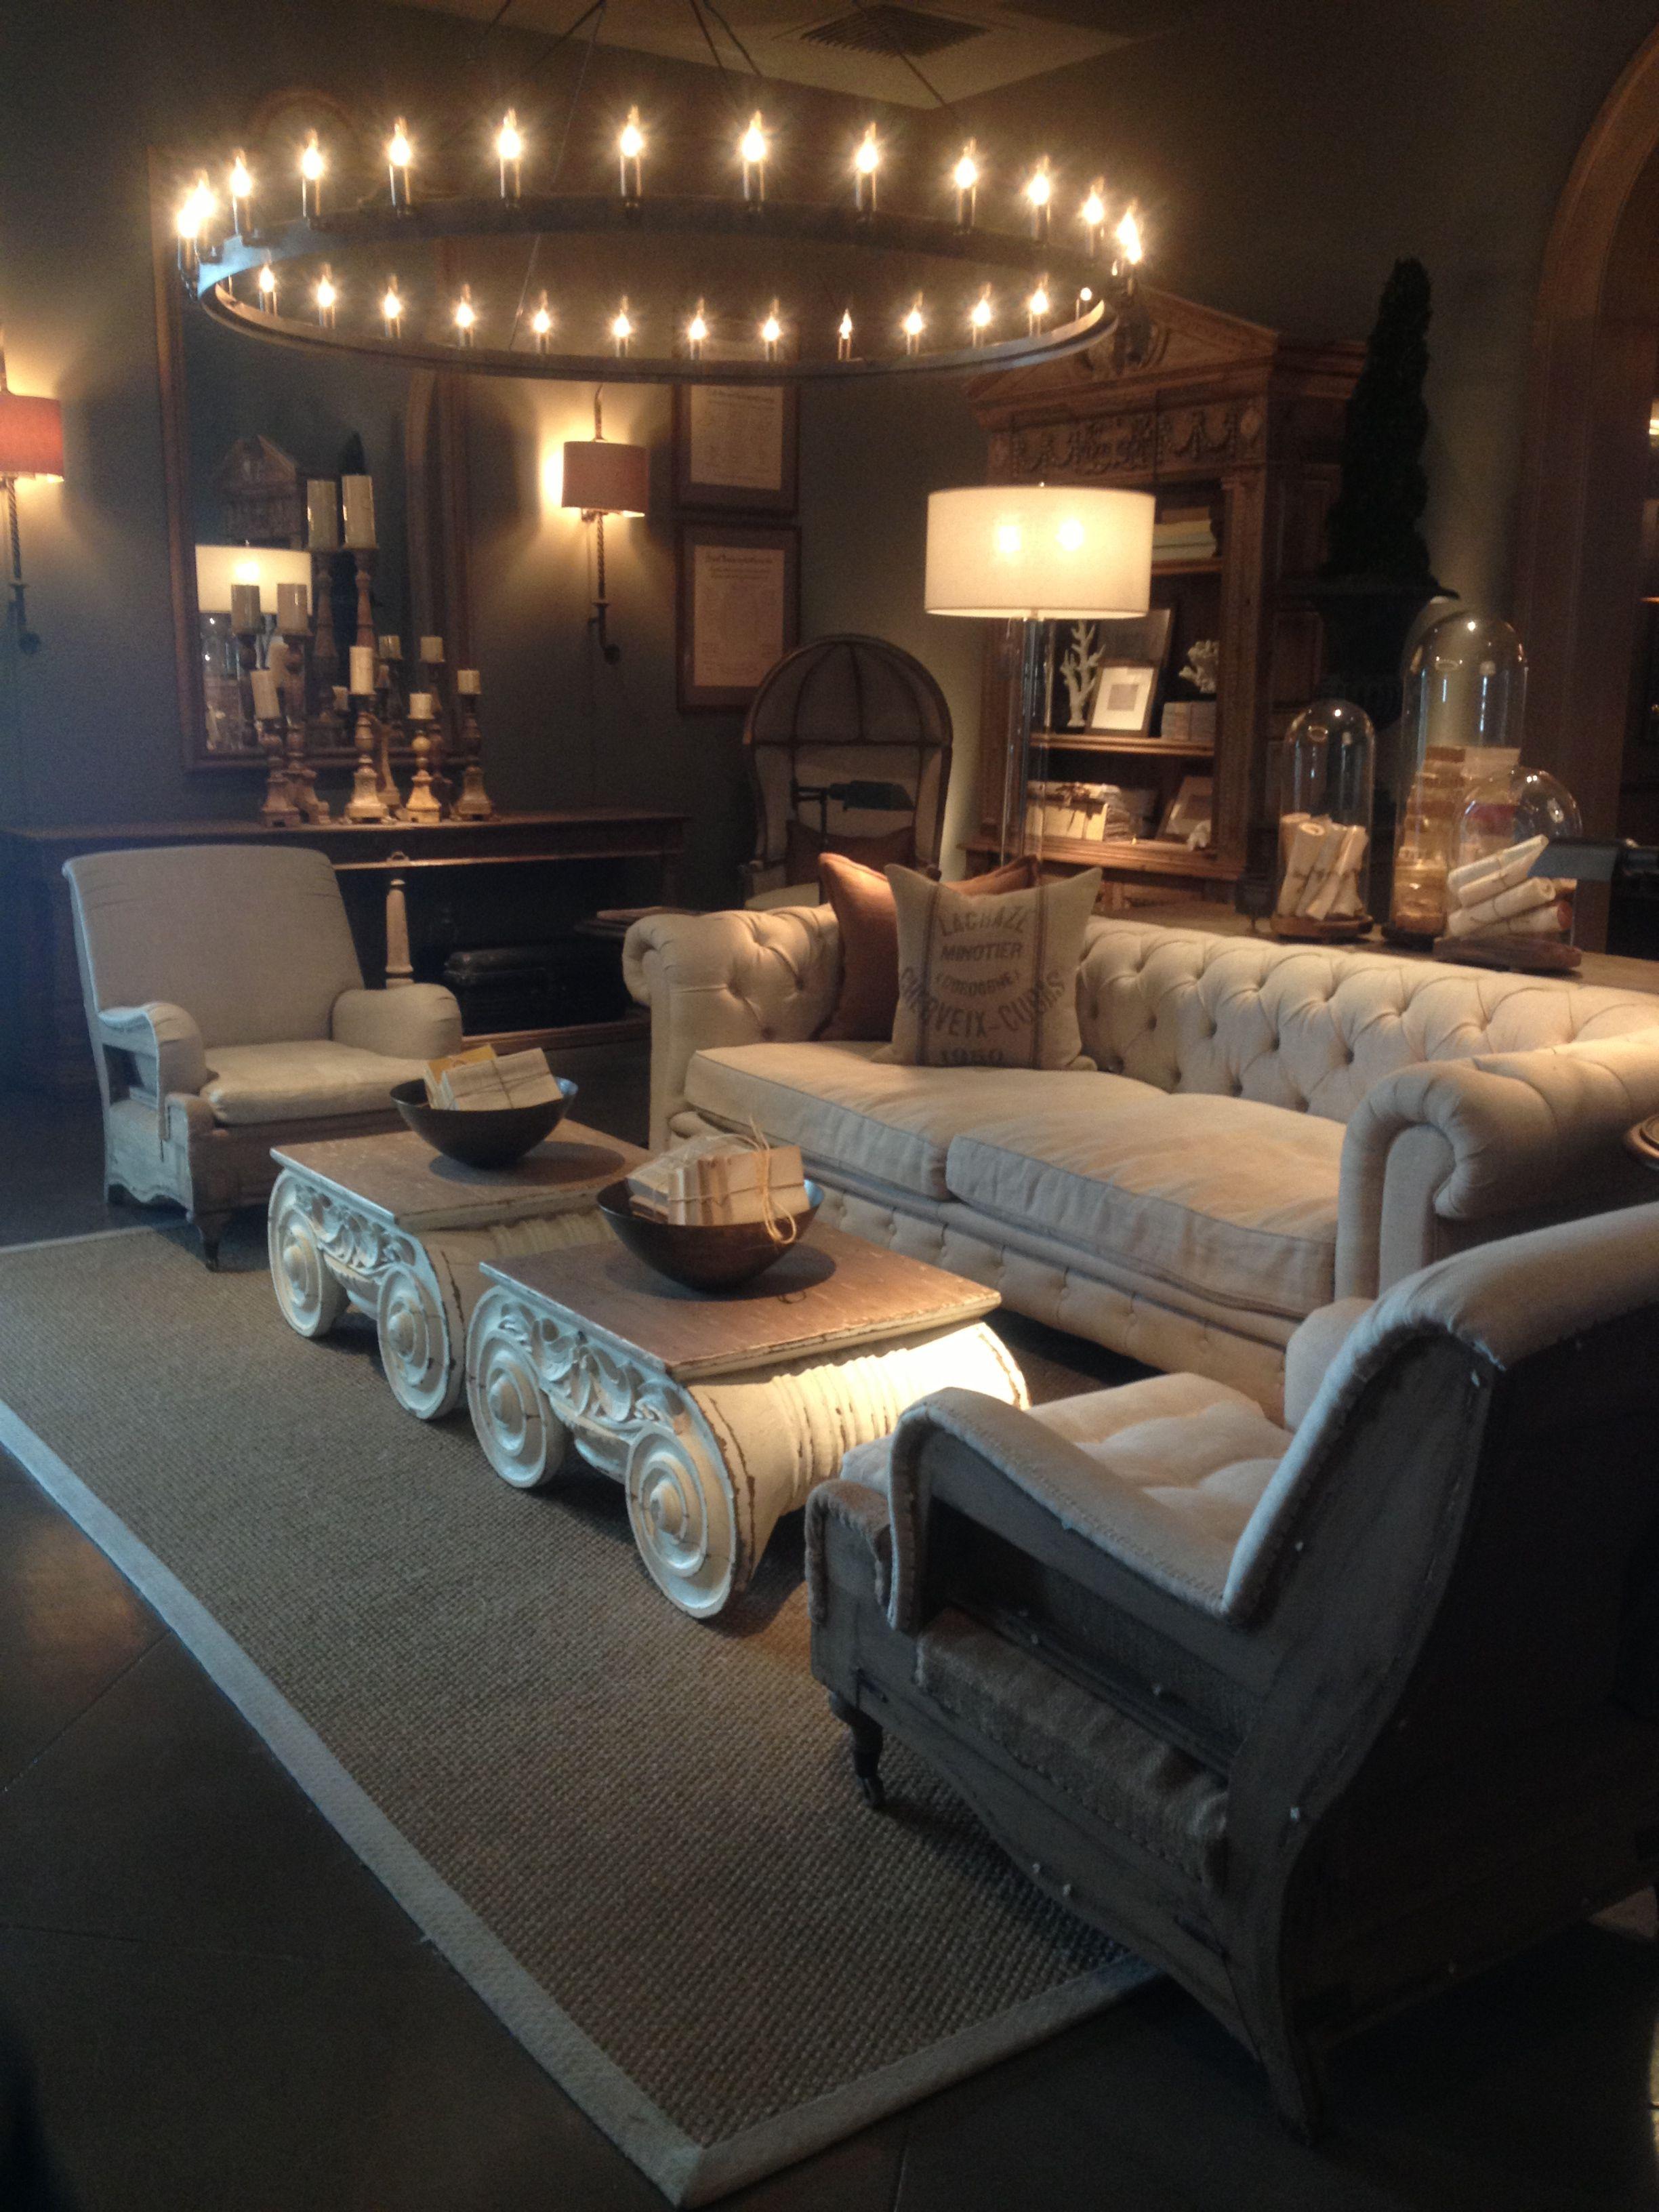 Restoration Hardware Living Room Dream Sofa Chesterfield Tufted